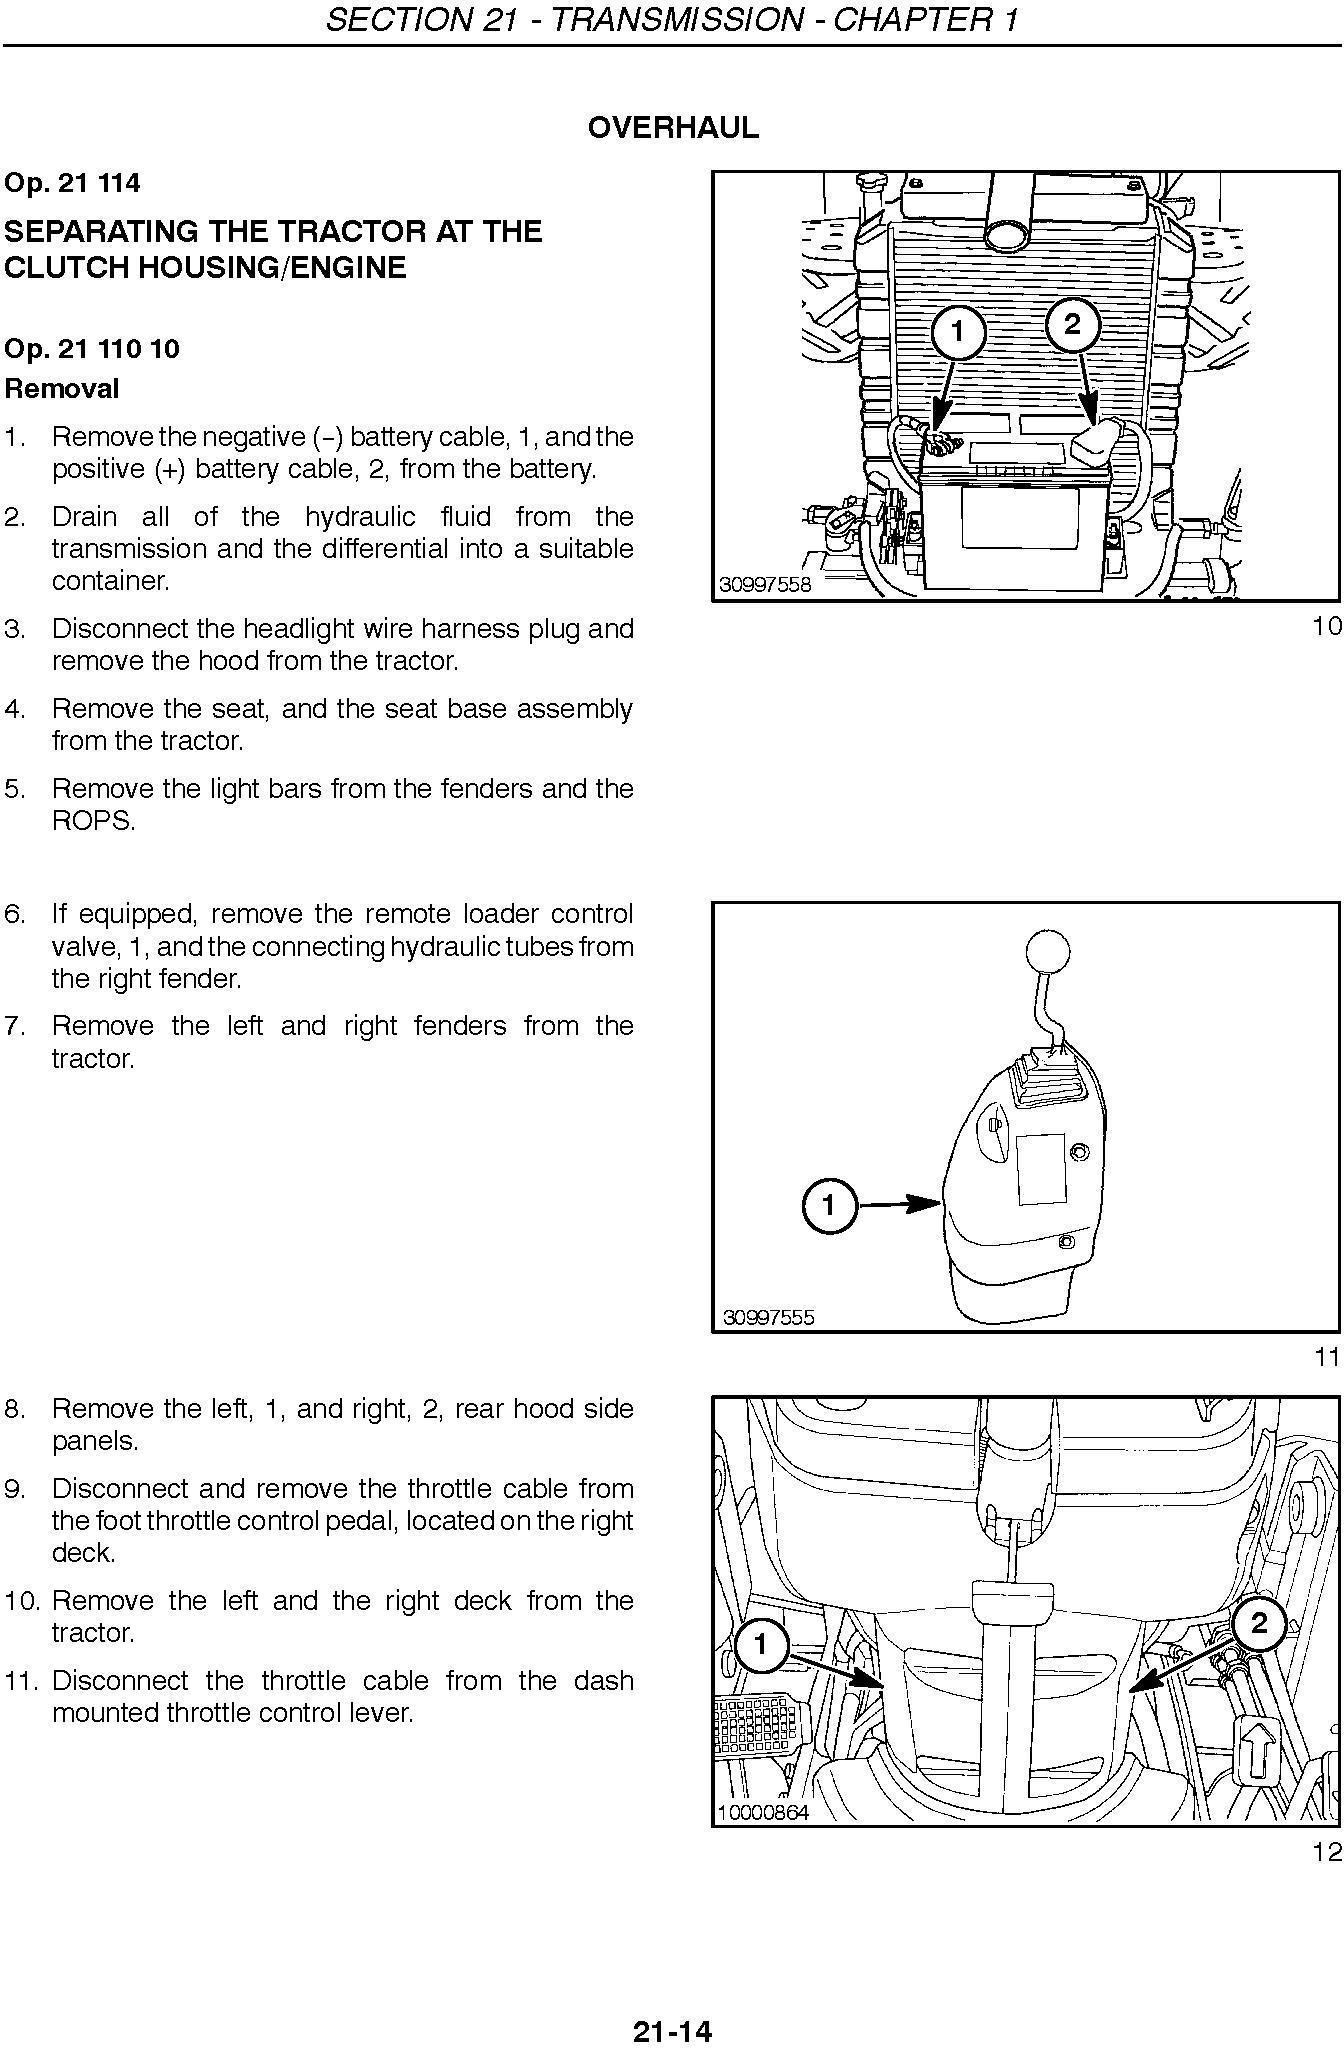 New Holland TC35A, TC35DA, TC40A, TC40DA, TC45A, TC45DA, Tractor Complete Service Manual - 1